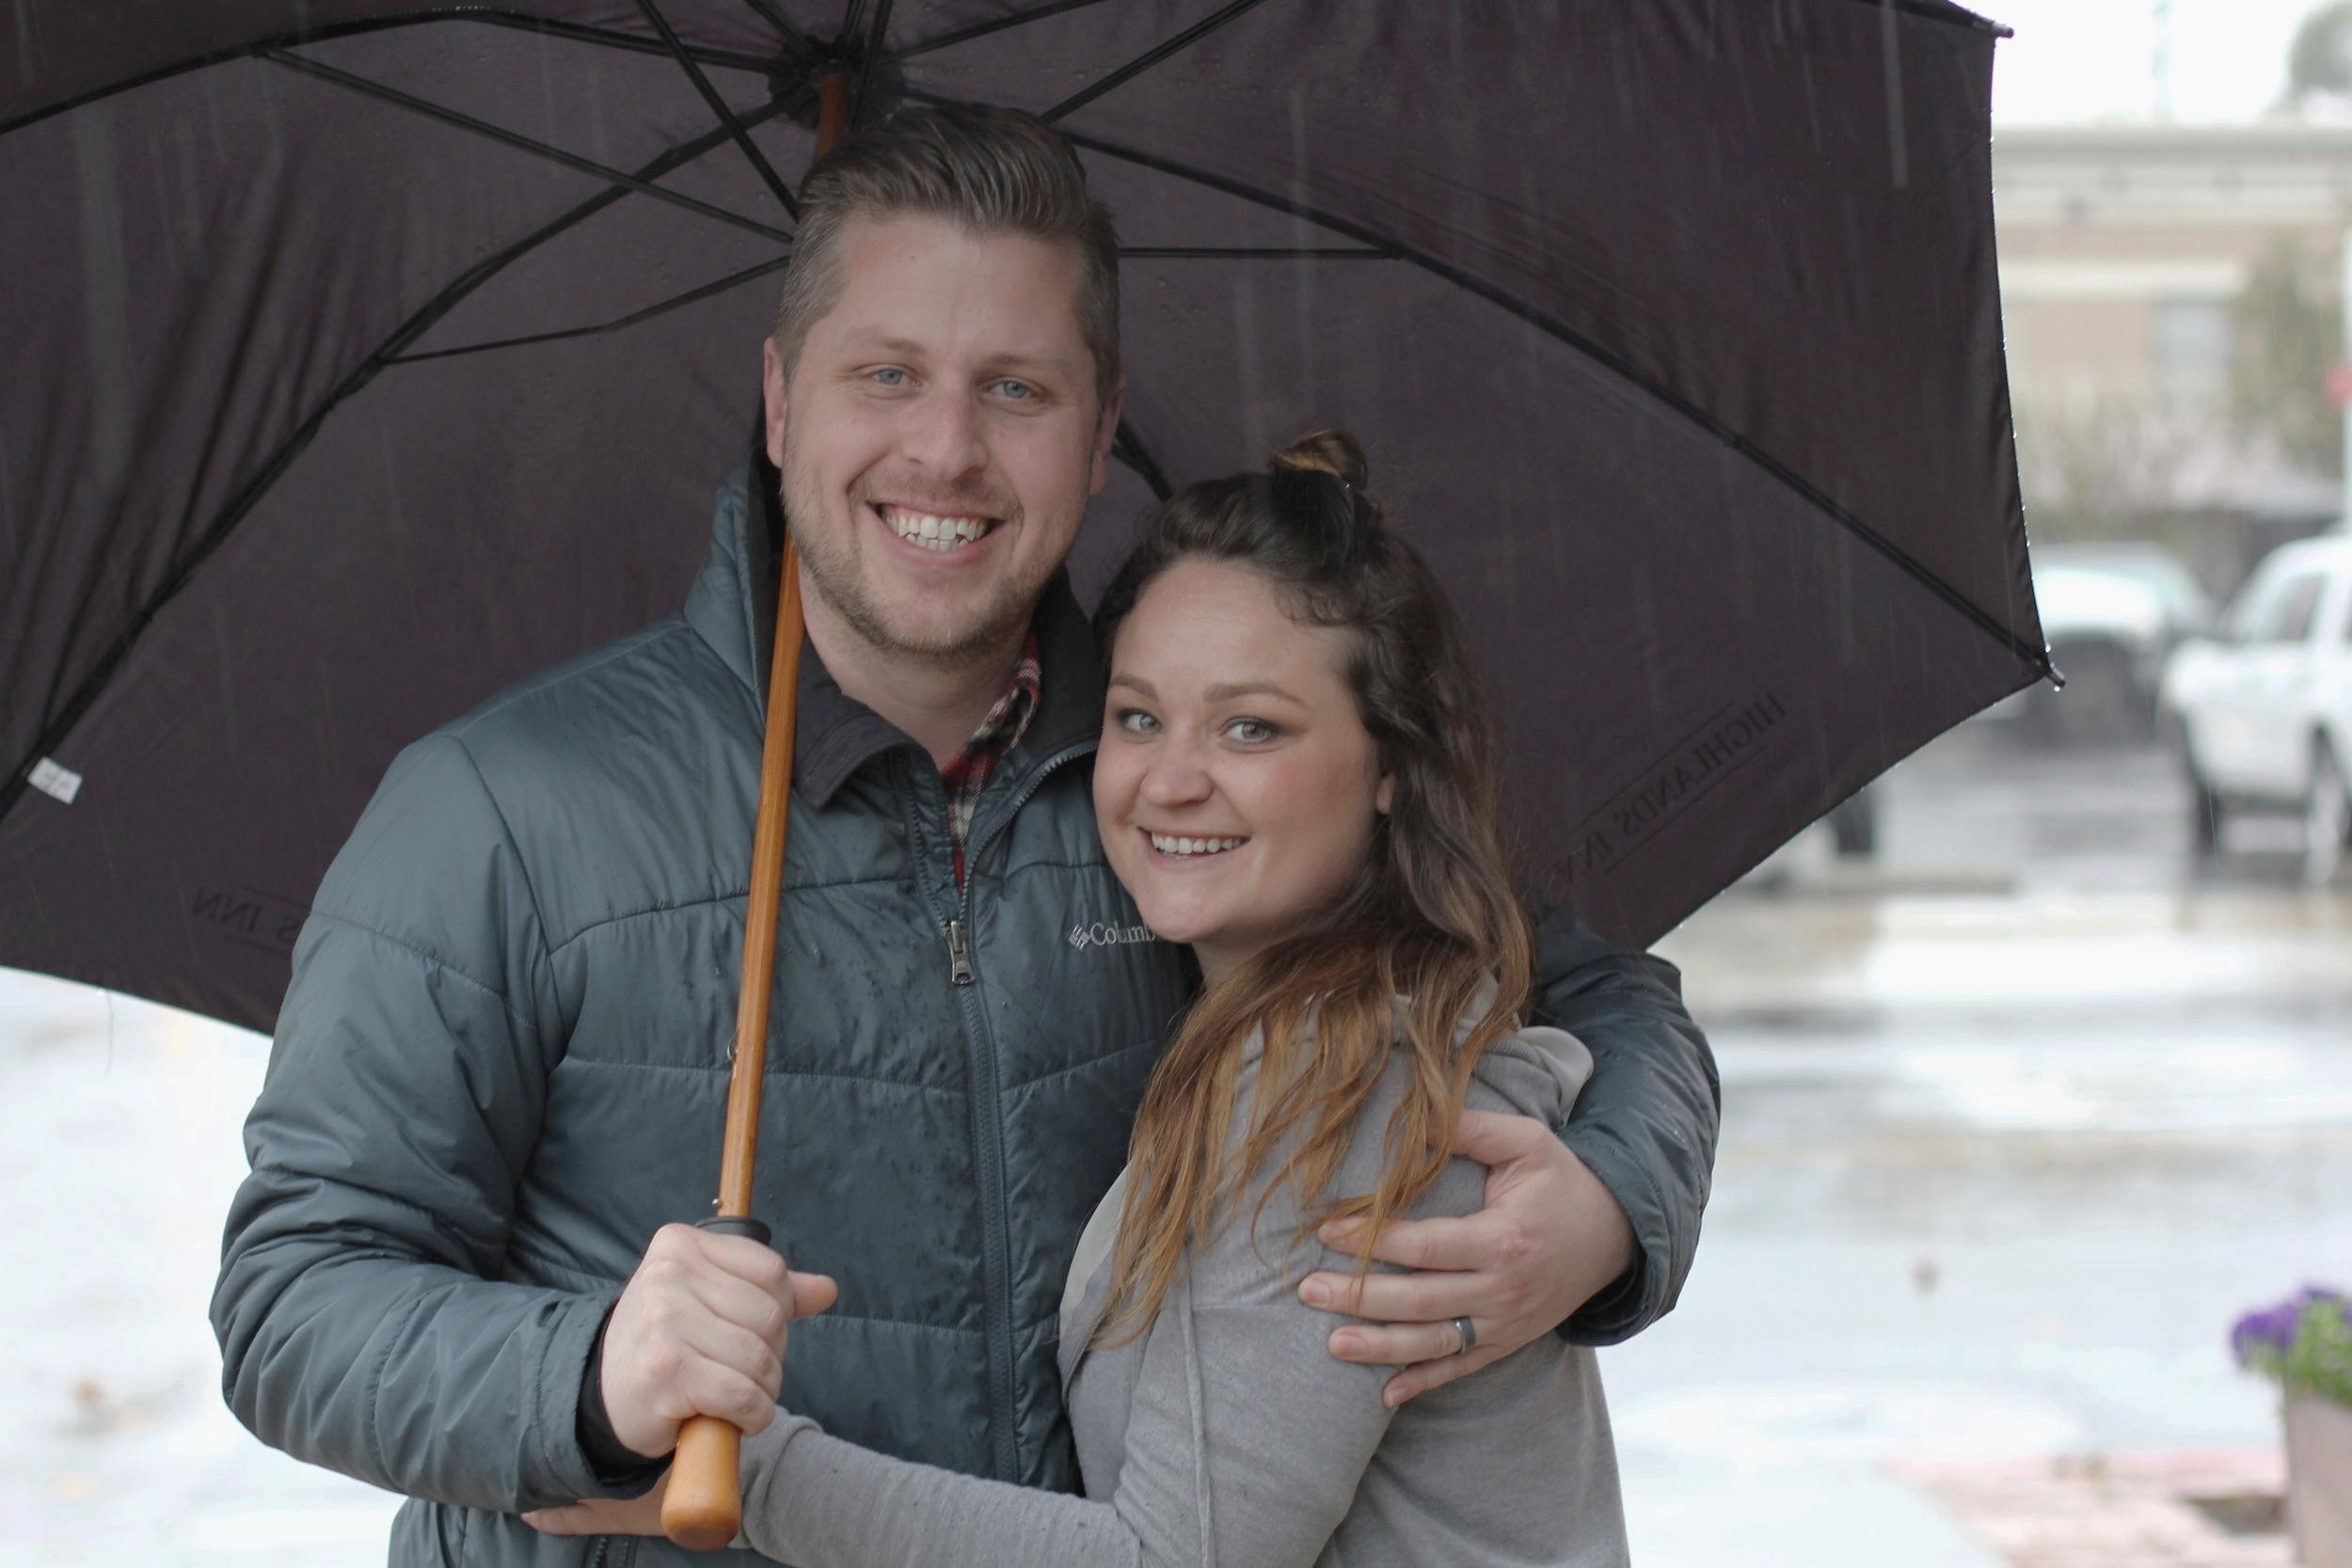 matt (missionary) & sarah have sung together often